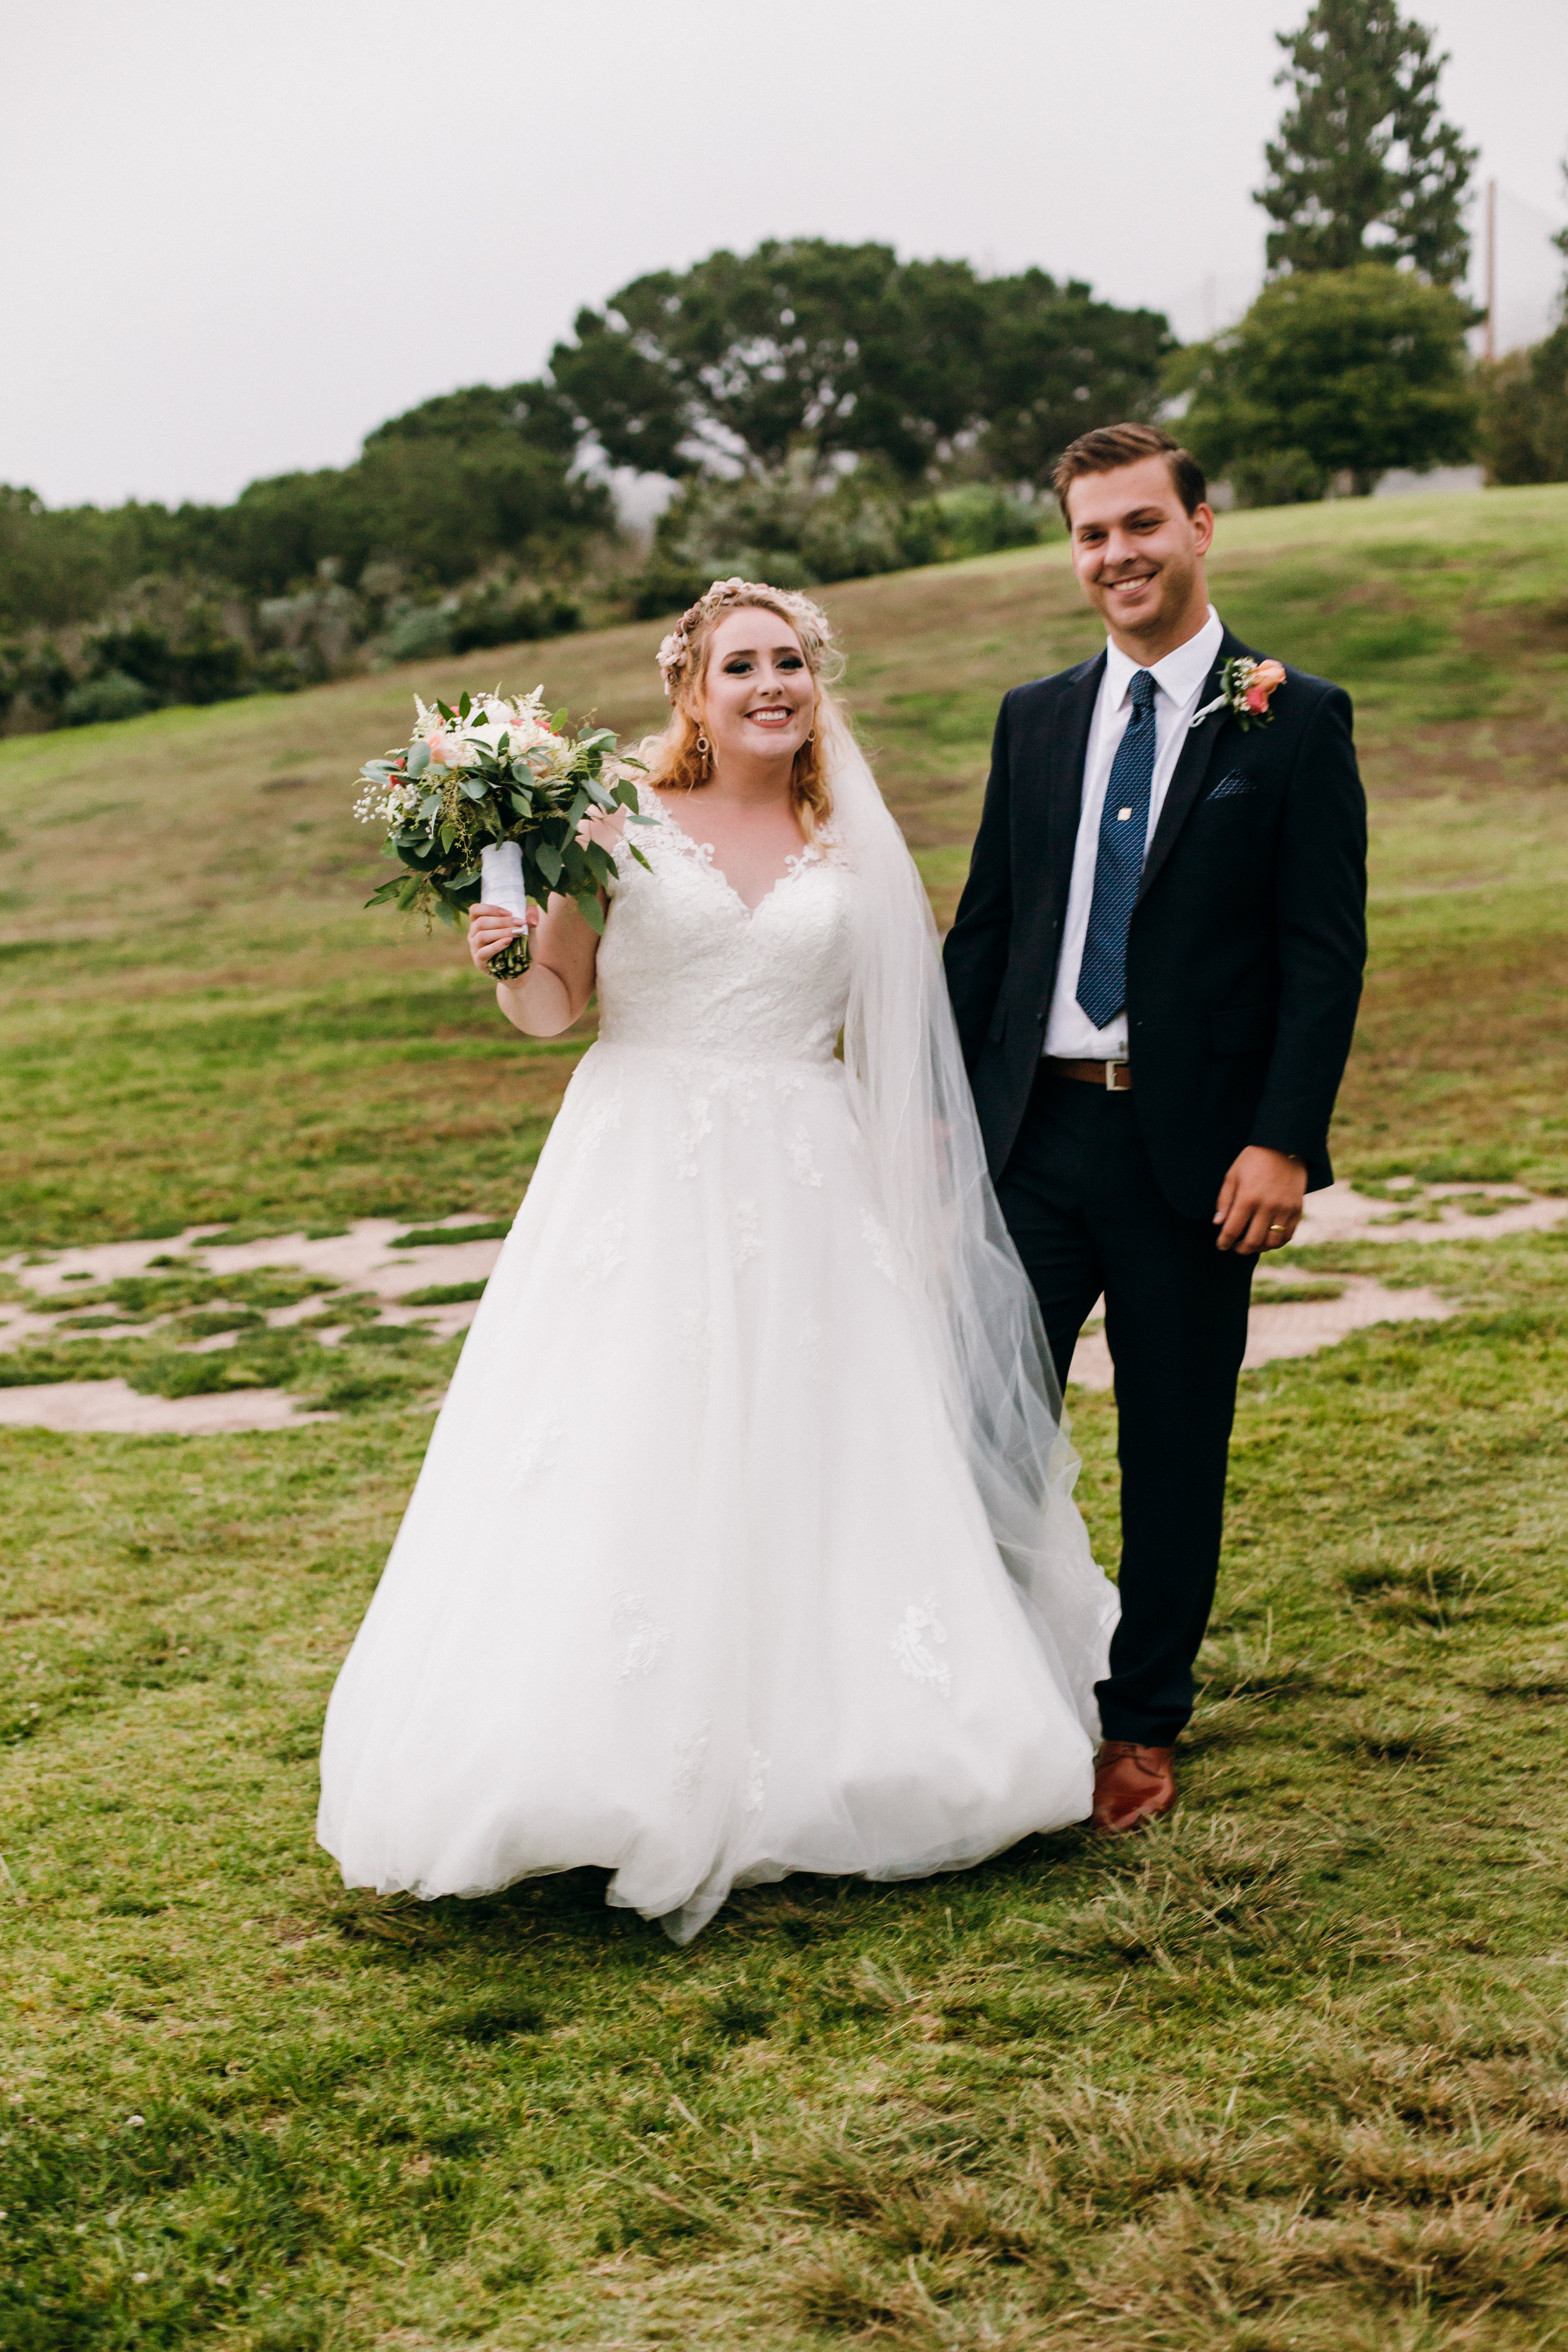 KaraNixonWeddings-PalosVerdes-Wedding-50.jpg